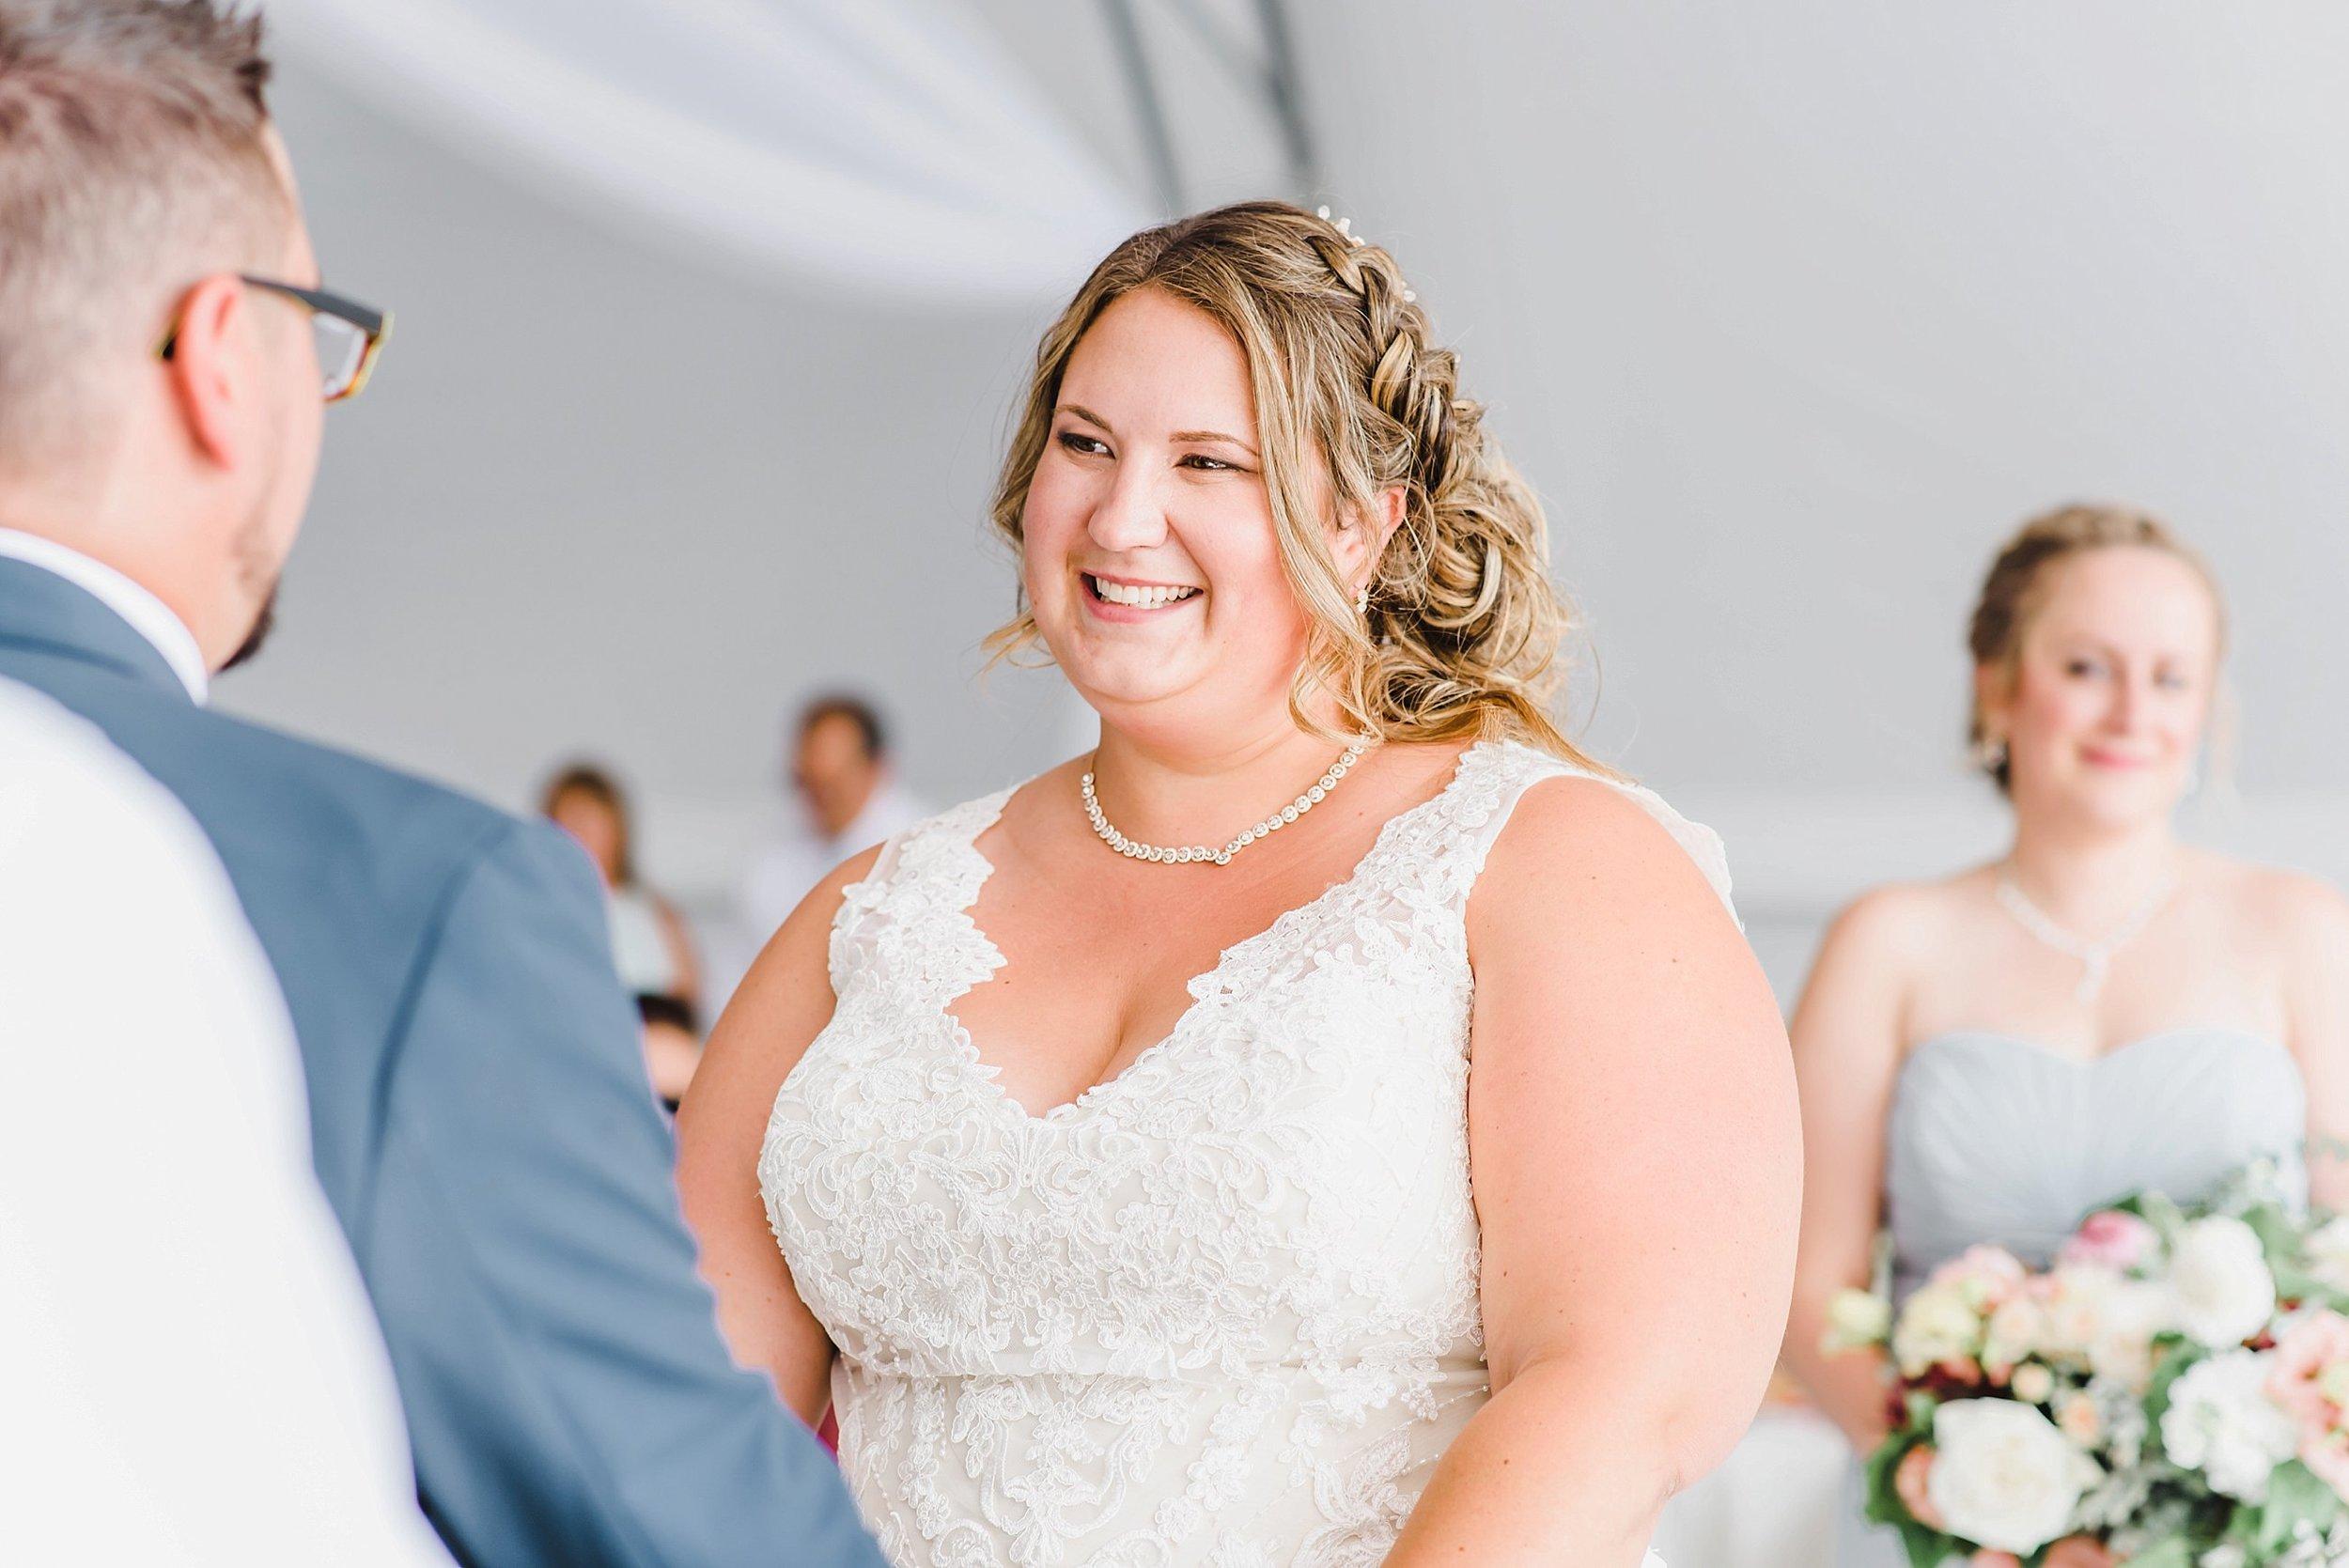 light airy indie fine art ottawa wedding photographer | Ali and Batoul Photography_0364.jpg